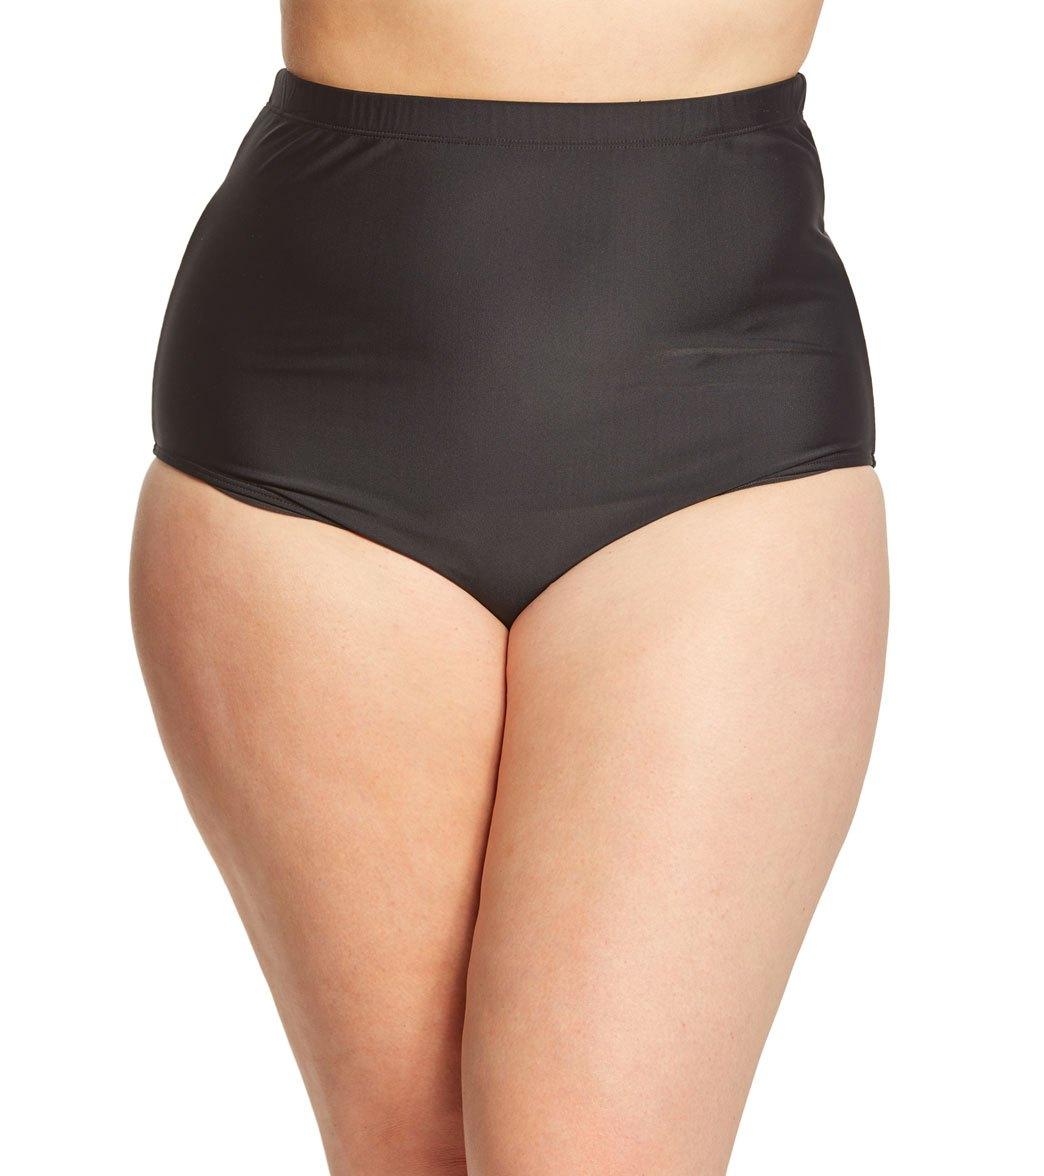 0fdb8dd03d2 ClubSwim Couture Plus Size Ultra High Waist Swim Brief Bottom at  SwimOutlet.com